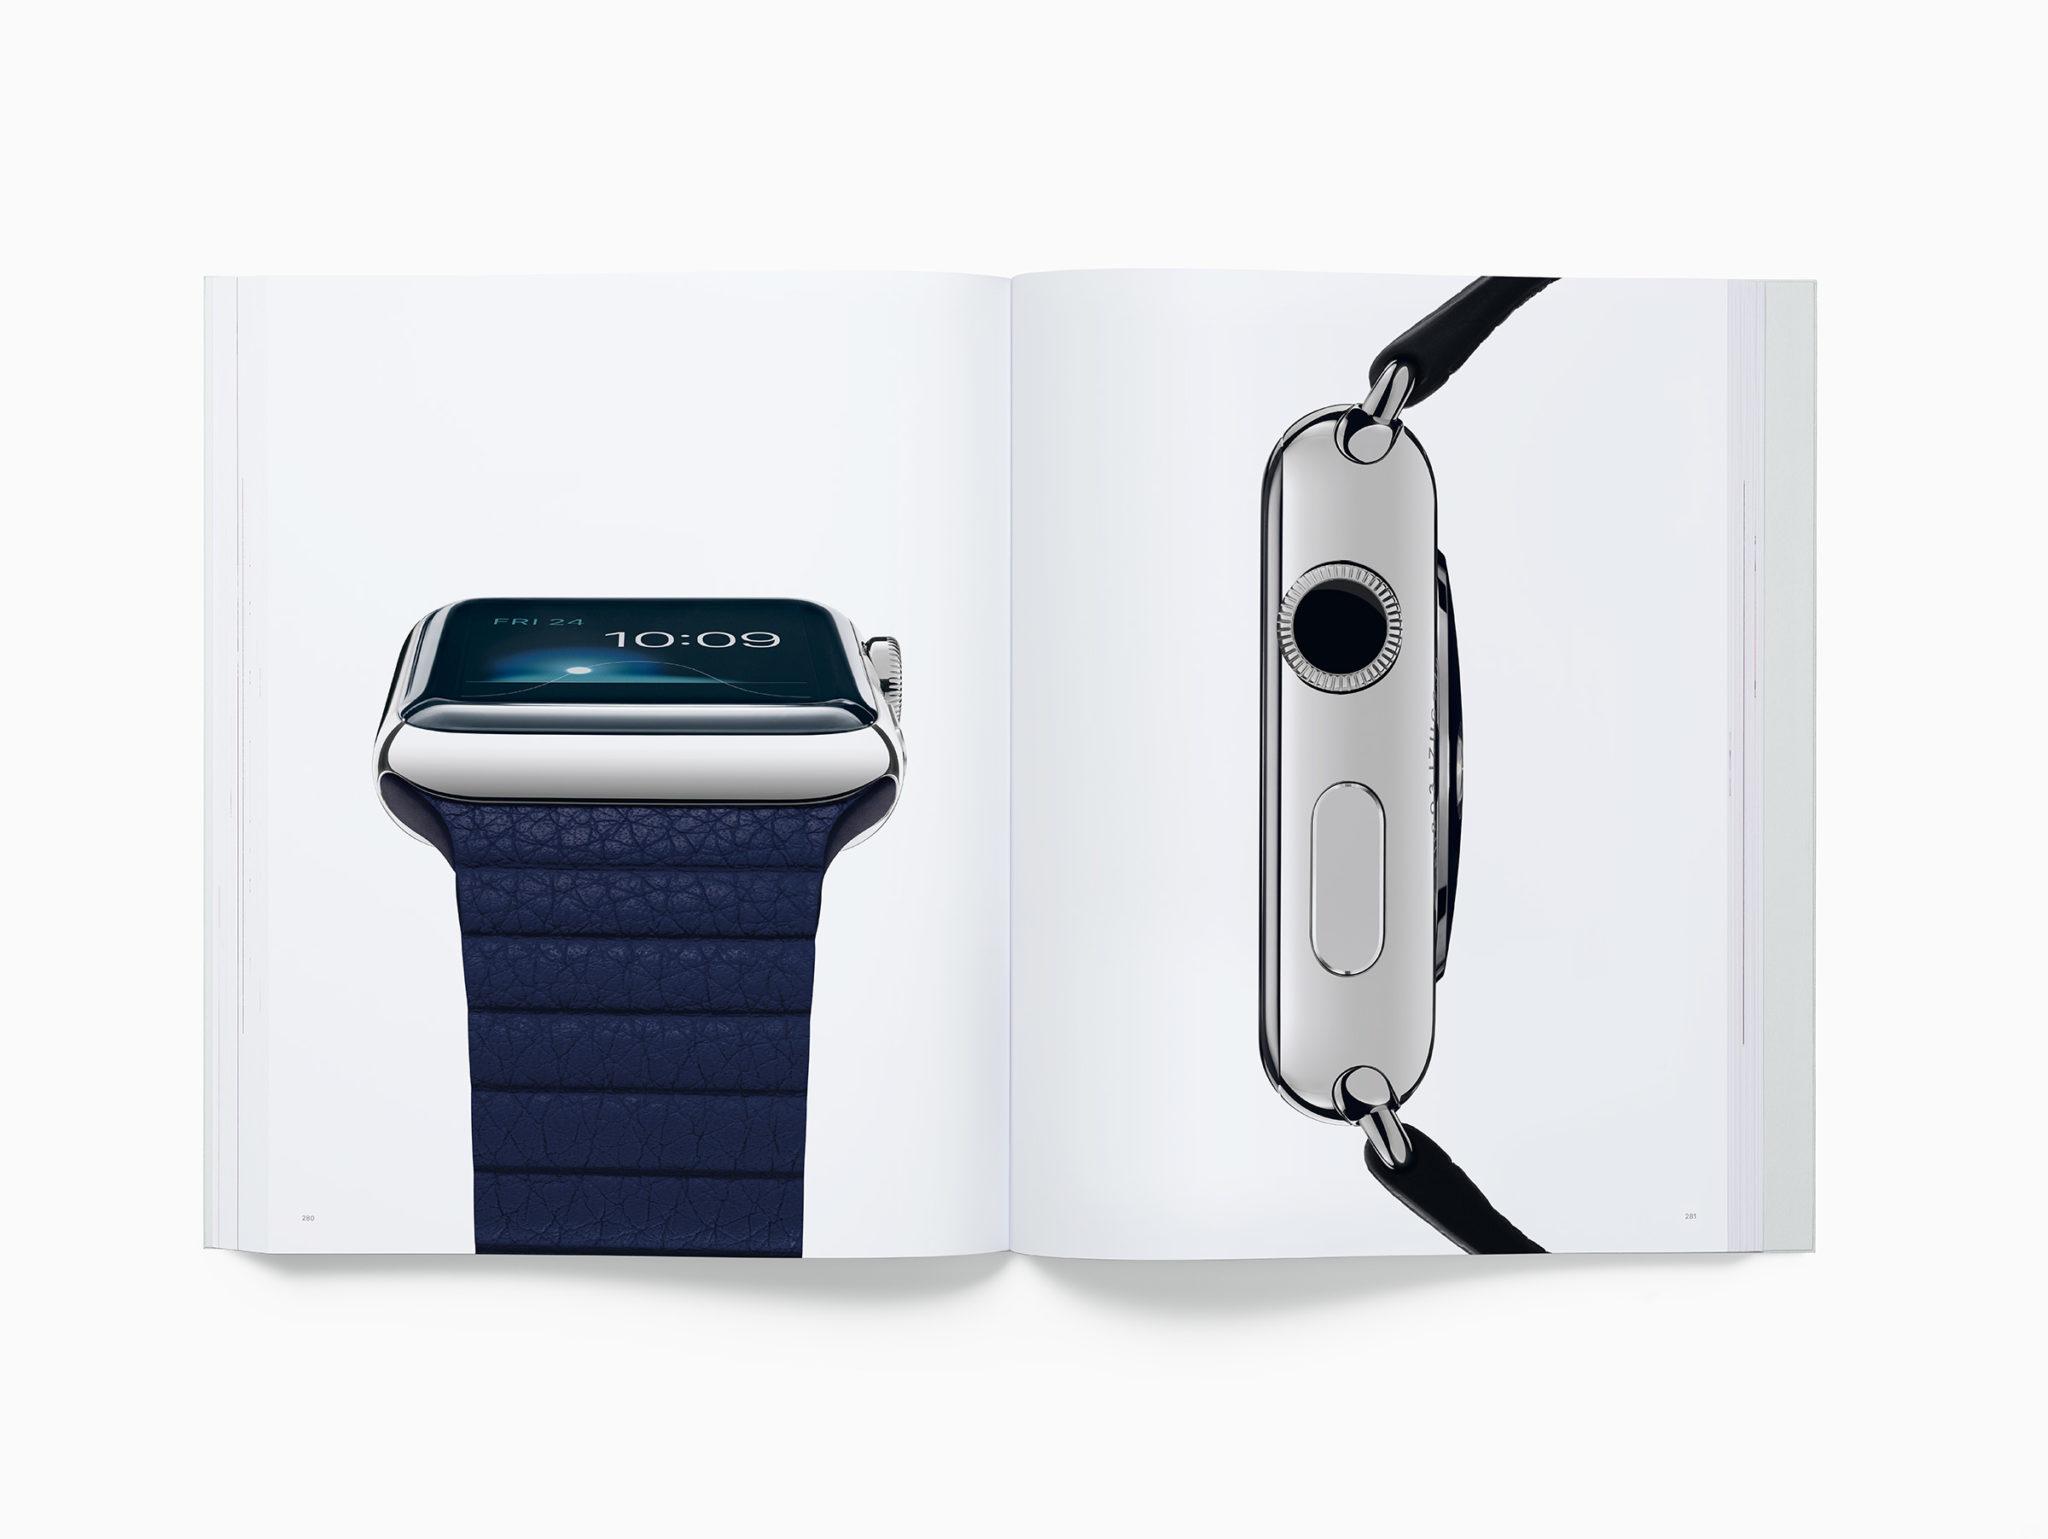 fot. WixTechs.com